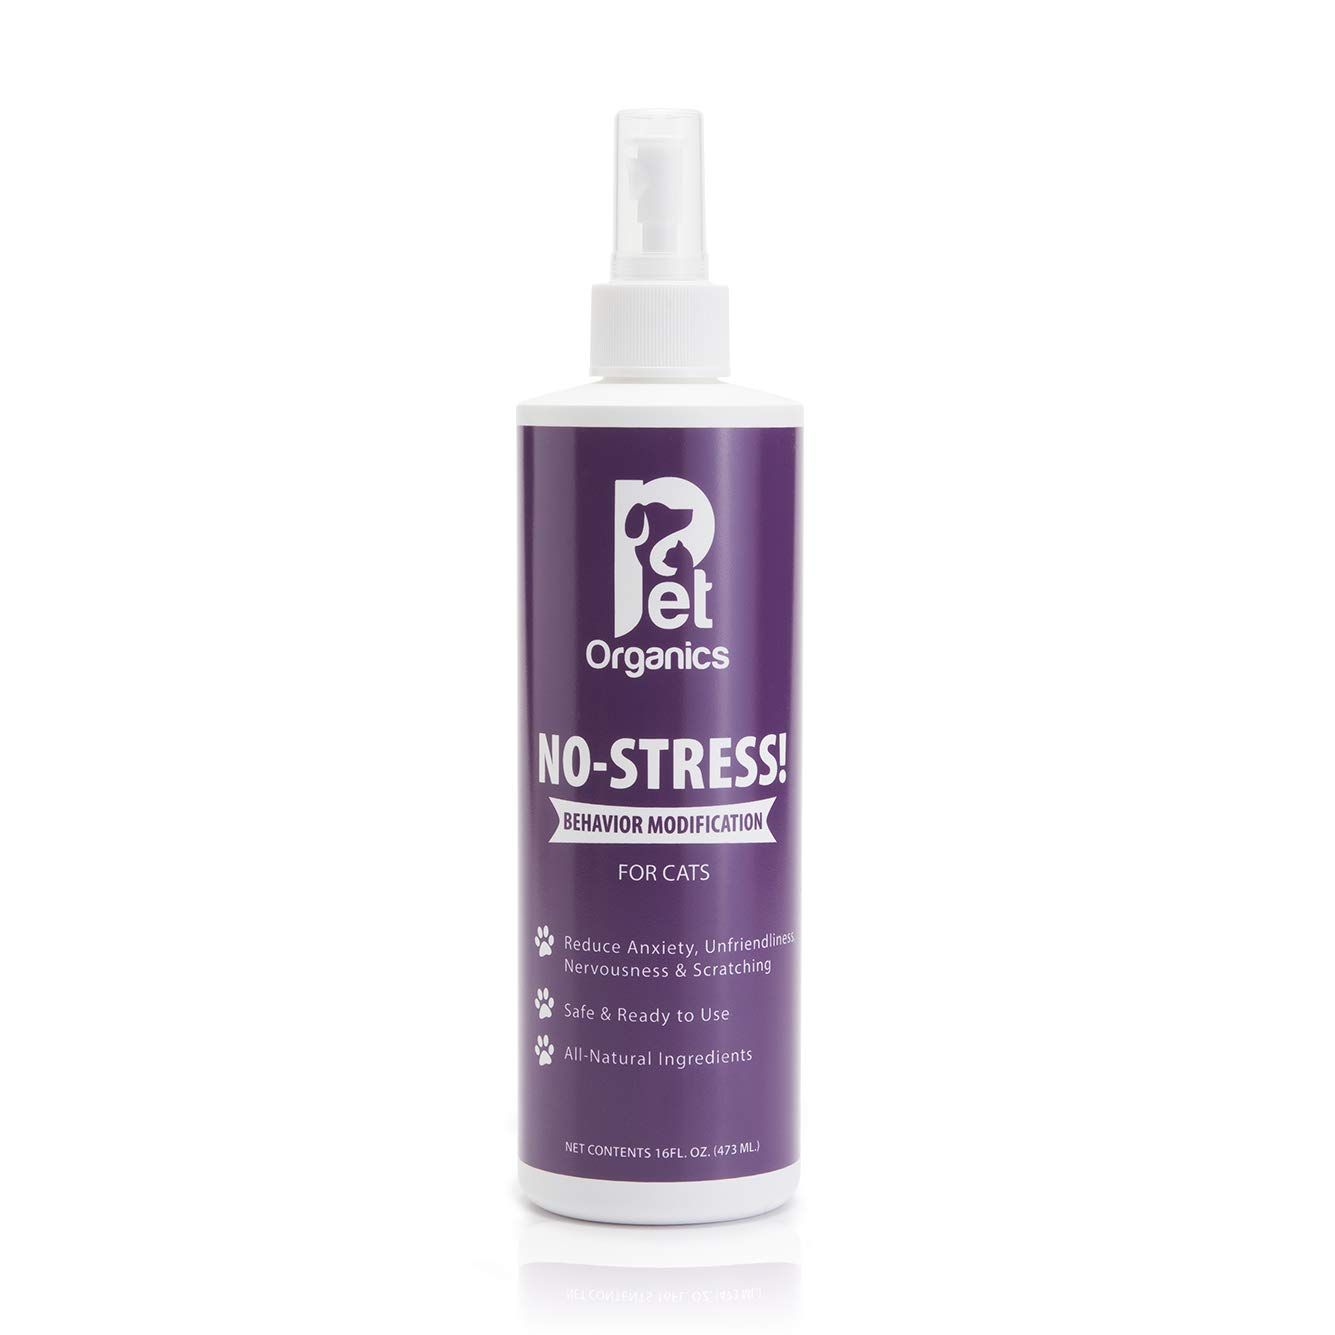 Pet Organics No-Stress Spray for Cats by Pet Organics